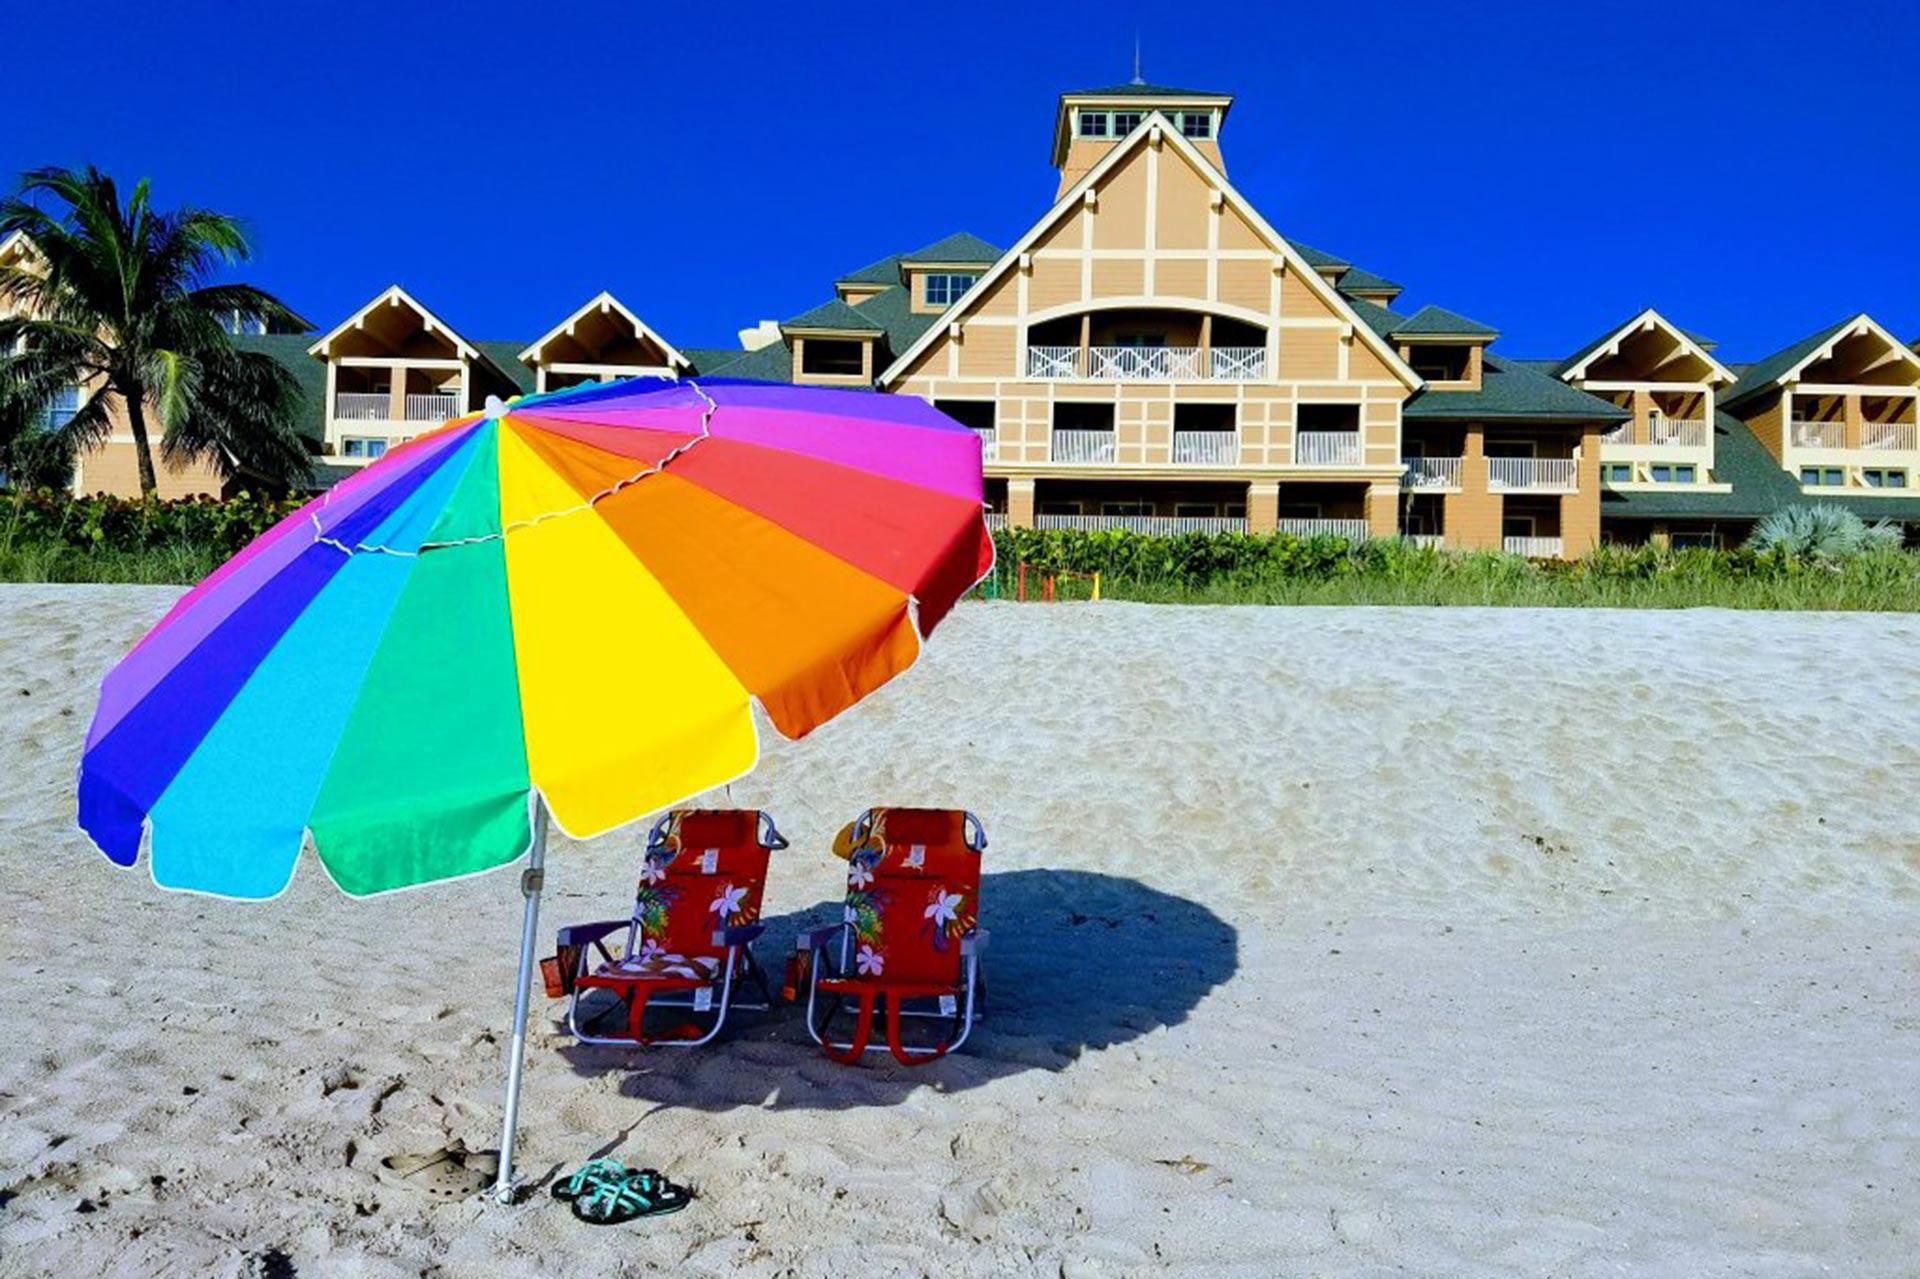 Disney's Vero Beach Resort in Vero Beach, Florida